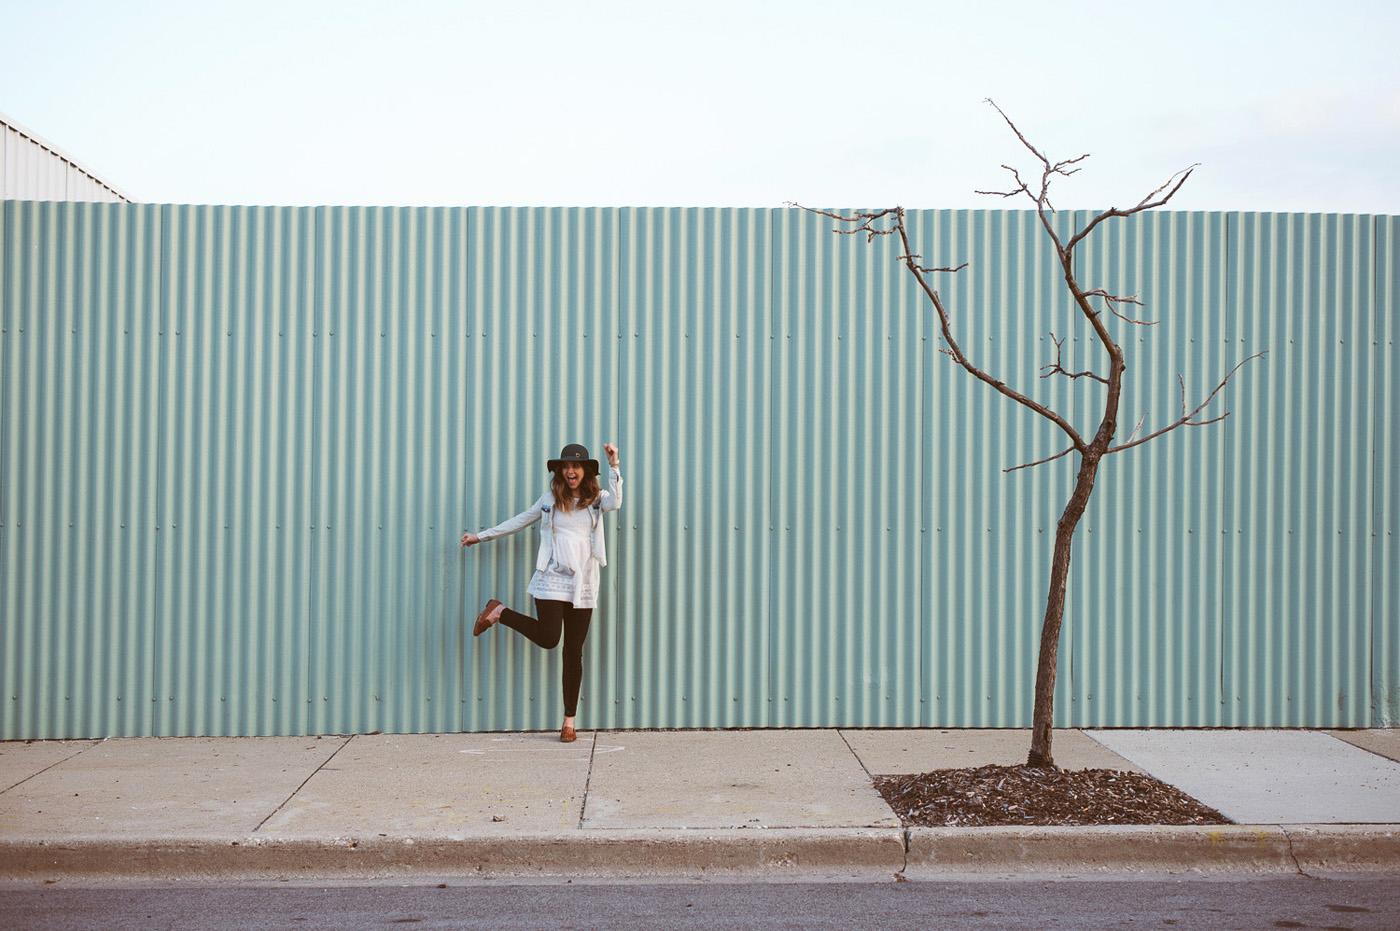 trustudio_Chicago_Lifestyle_Photography_Kara-8.jpg